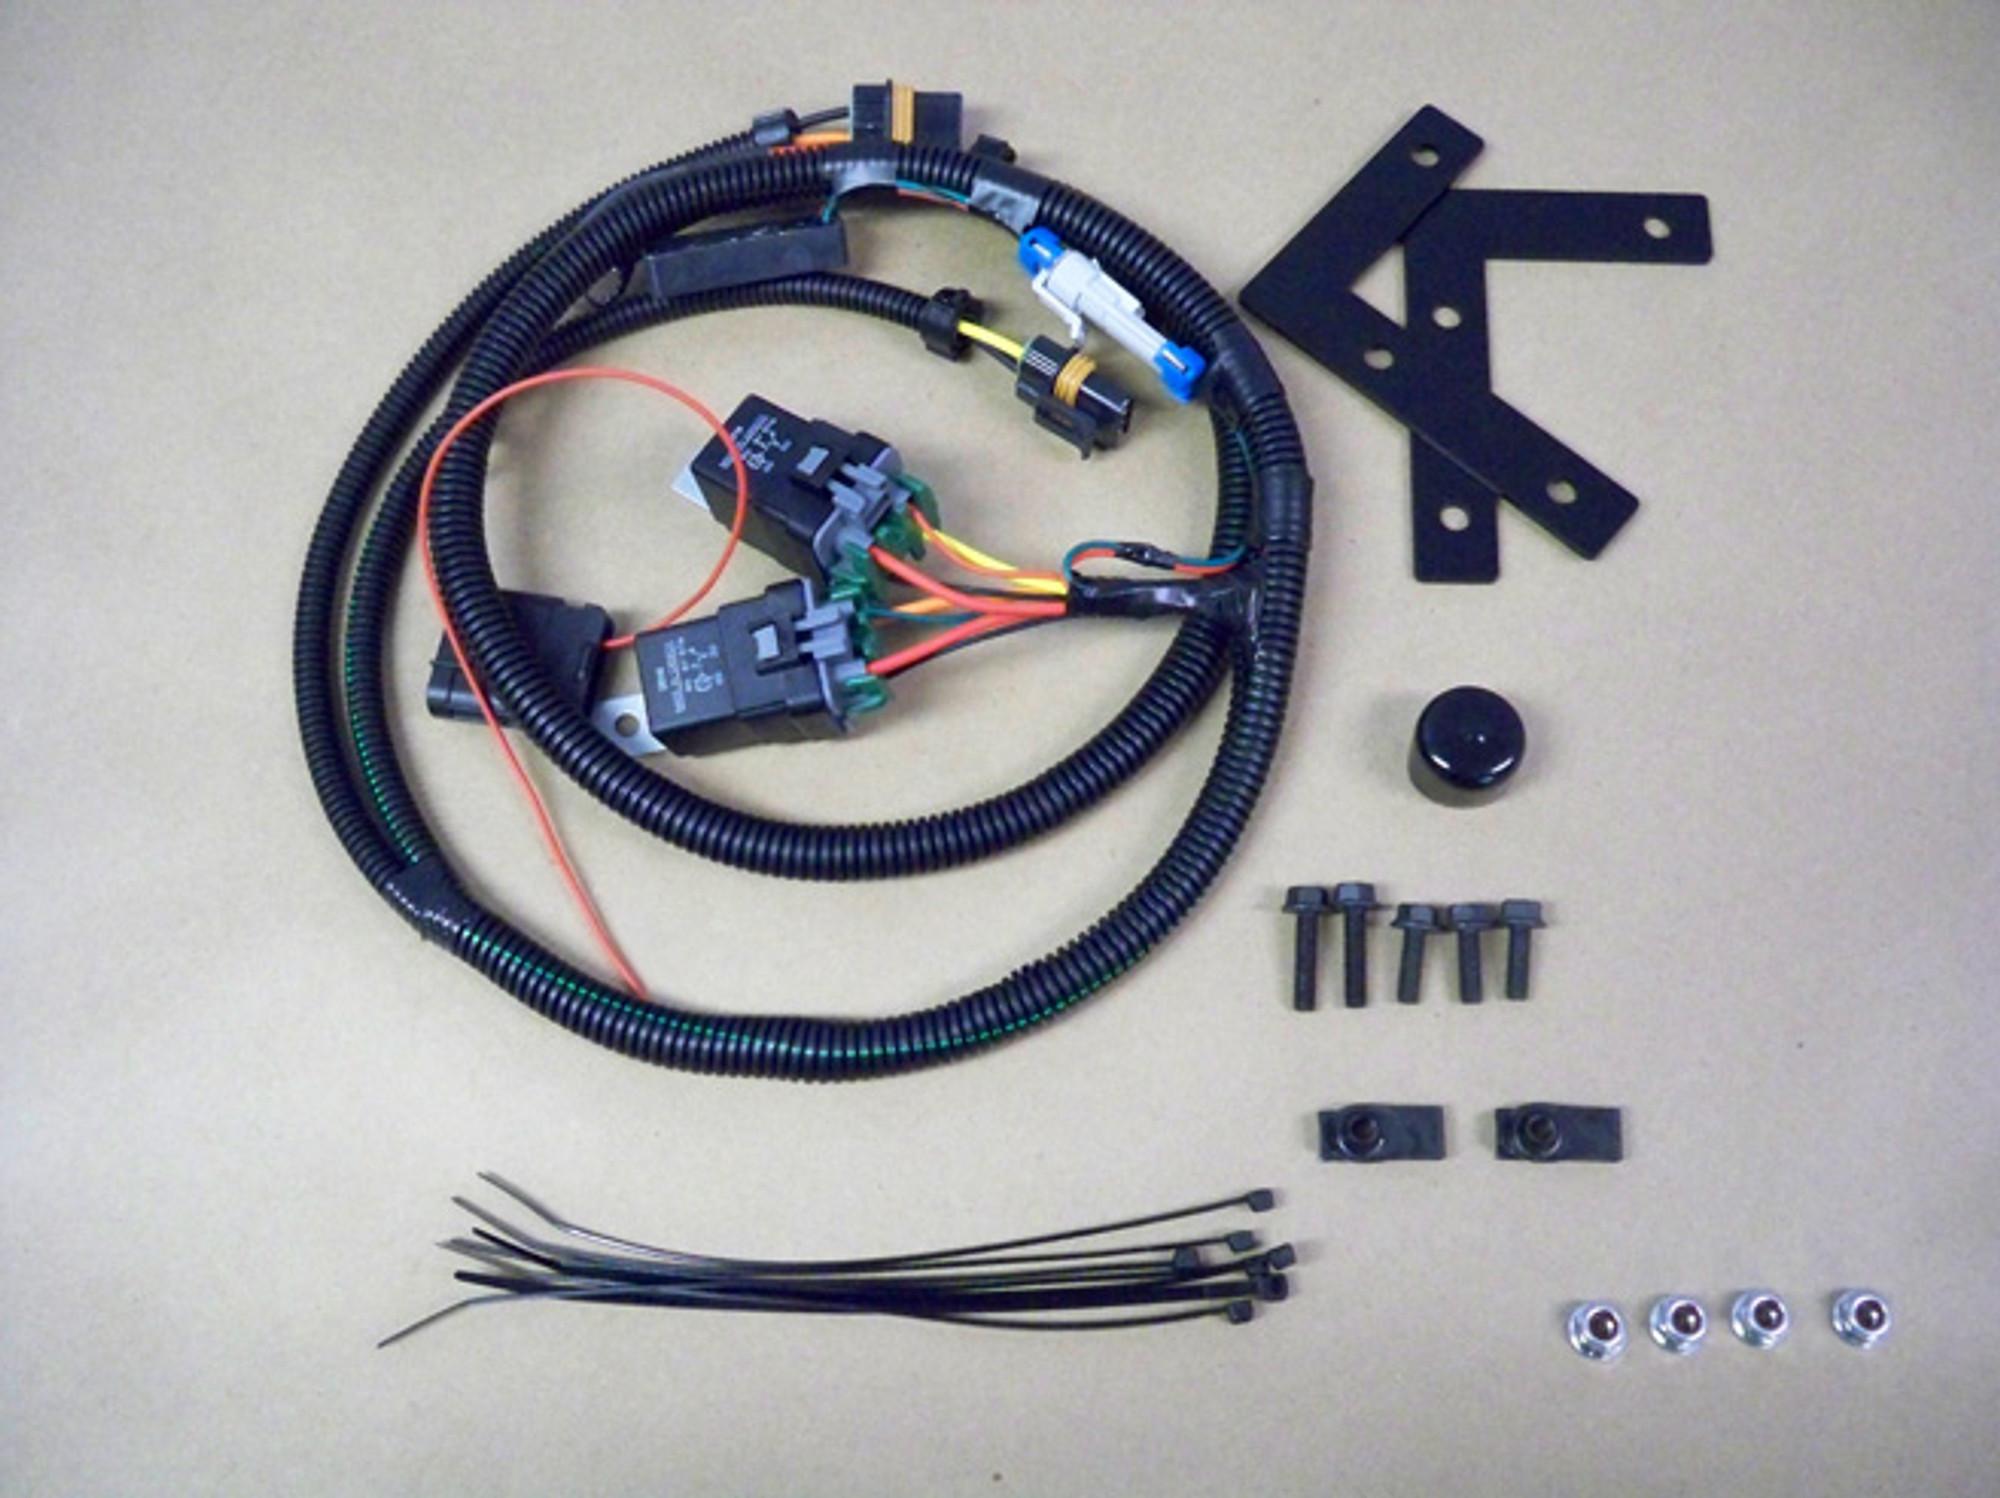 hight resolution of pcmforless 2007 trailblazer ss ls1 dual fan conversion kit tick performance inc